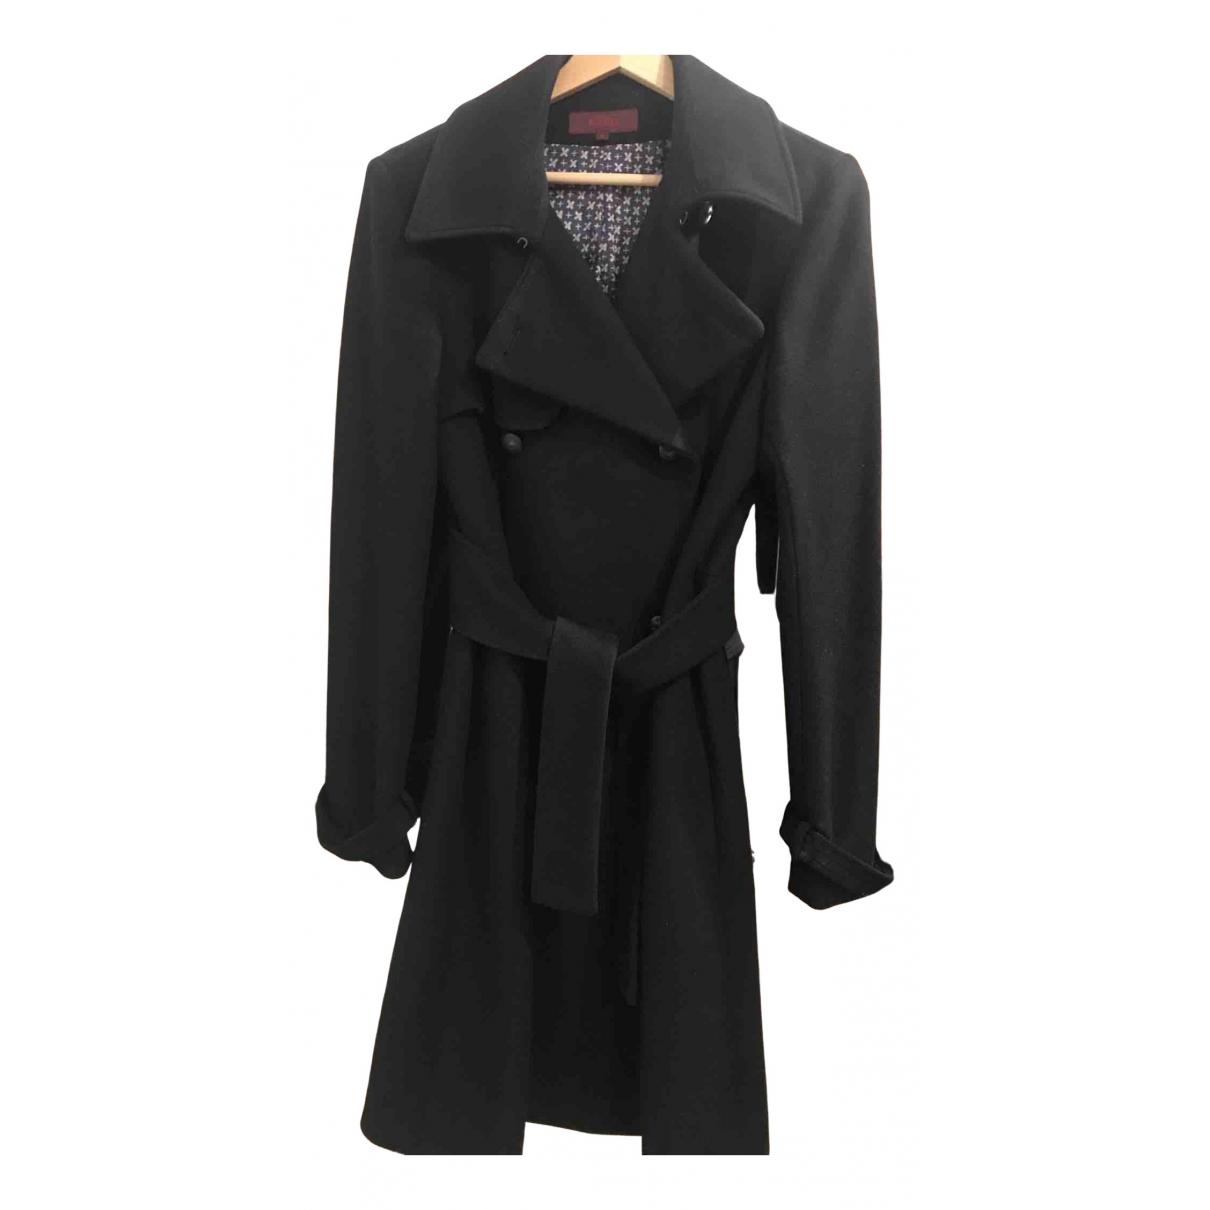 Kenzo N Black Cashmere coat for Women 36 FR